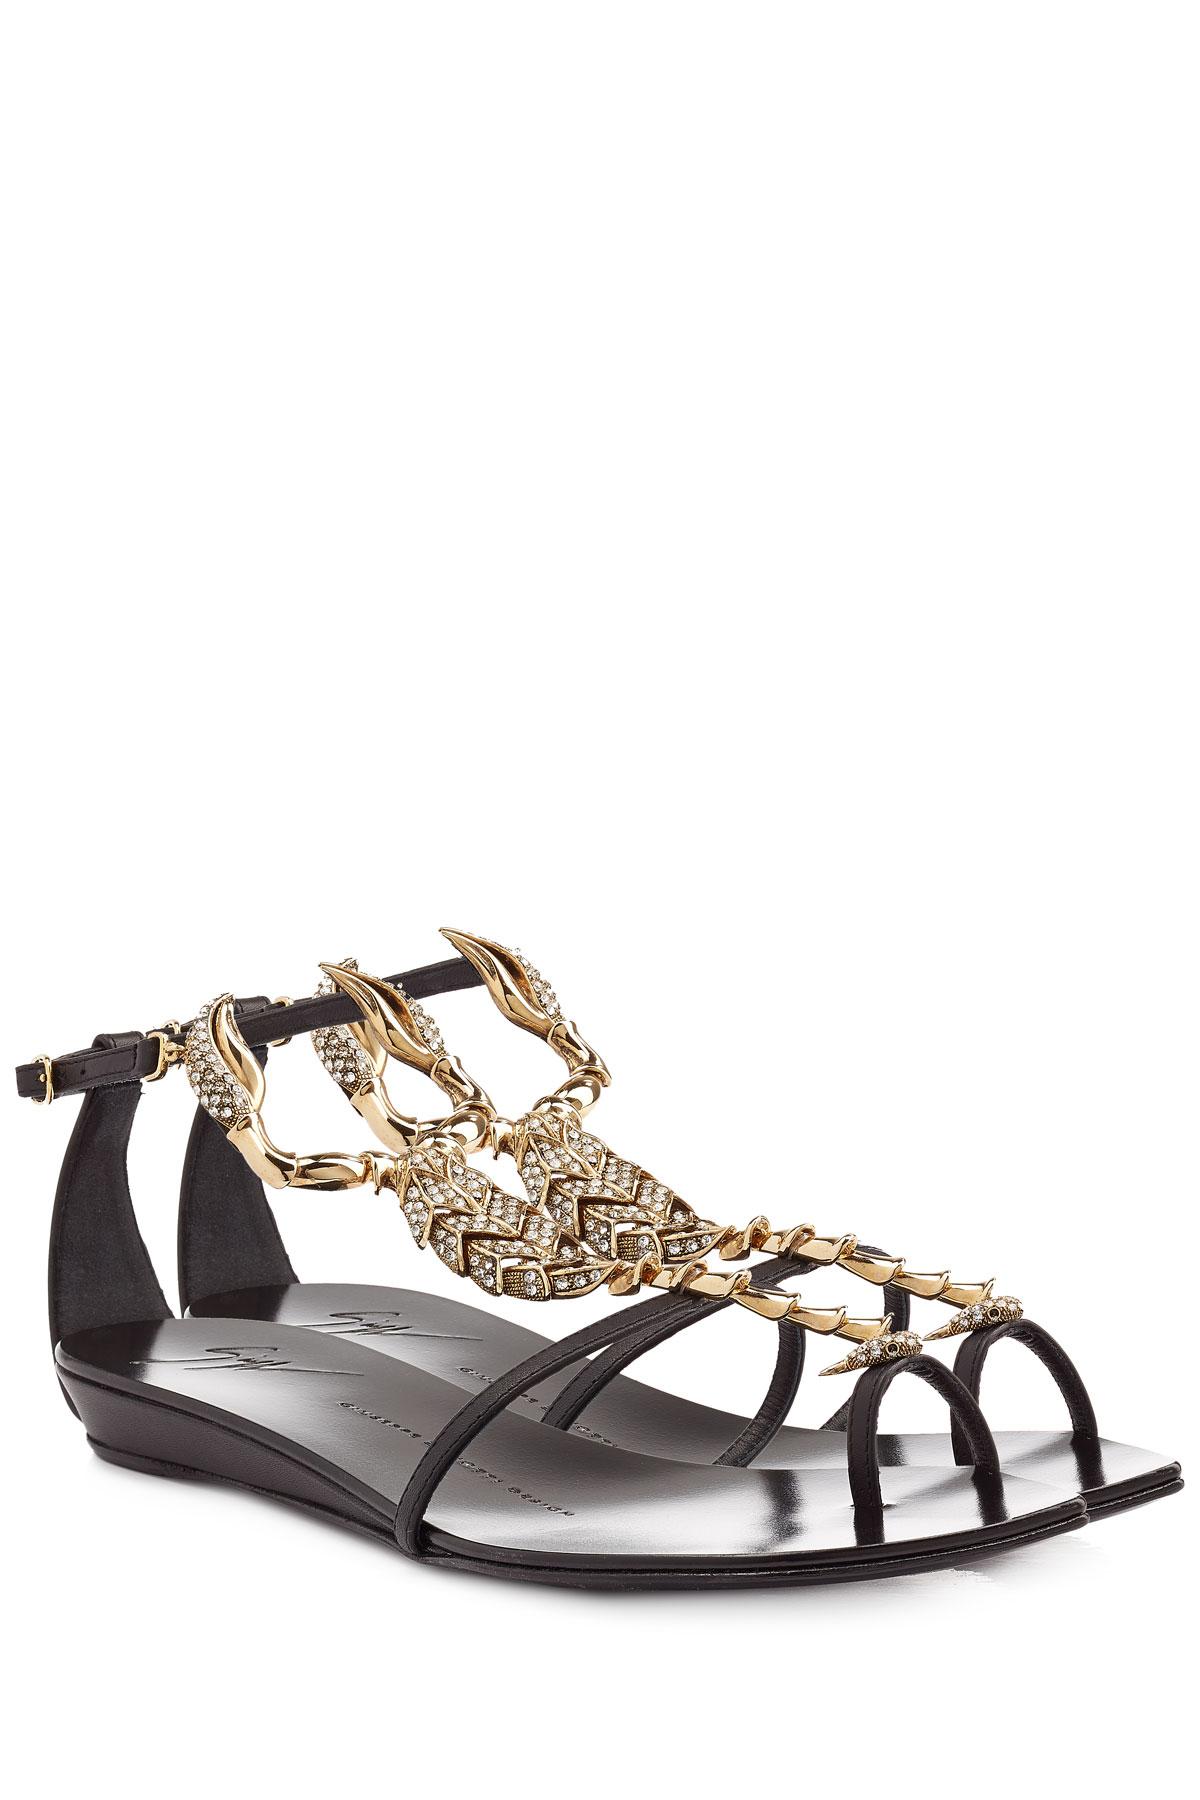 Lyst - Giuseppe Zanotti Bejeweled Scorpion Flat Sandal In ...